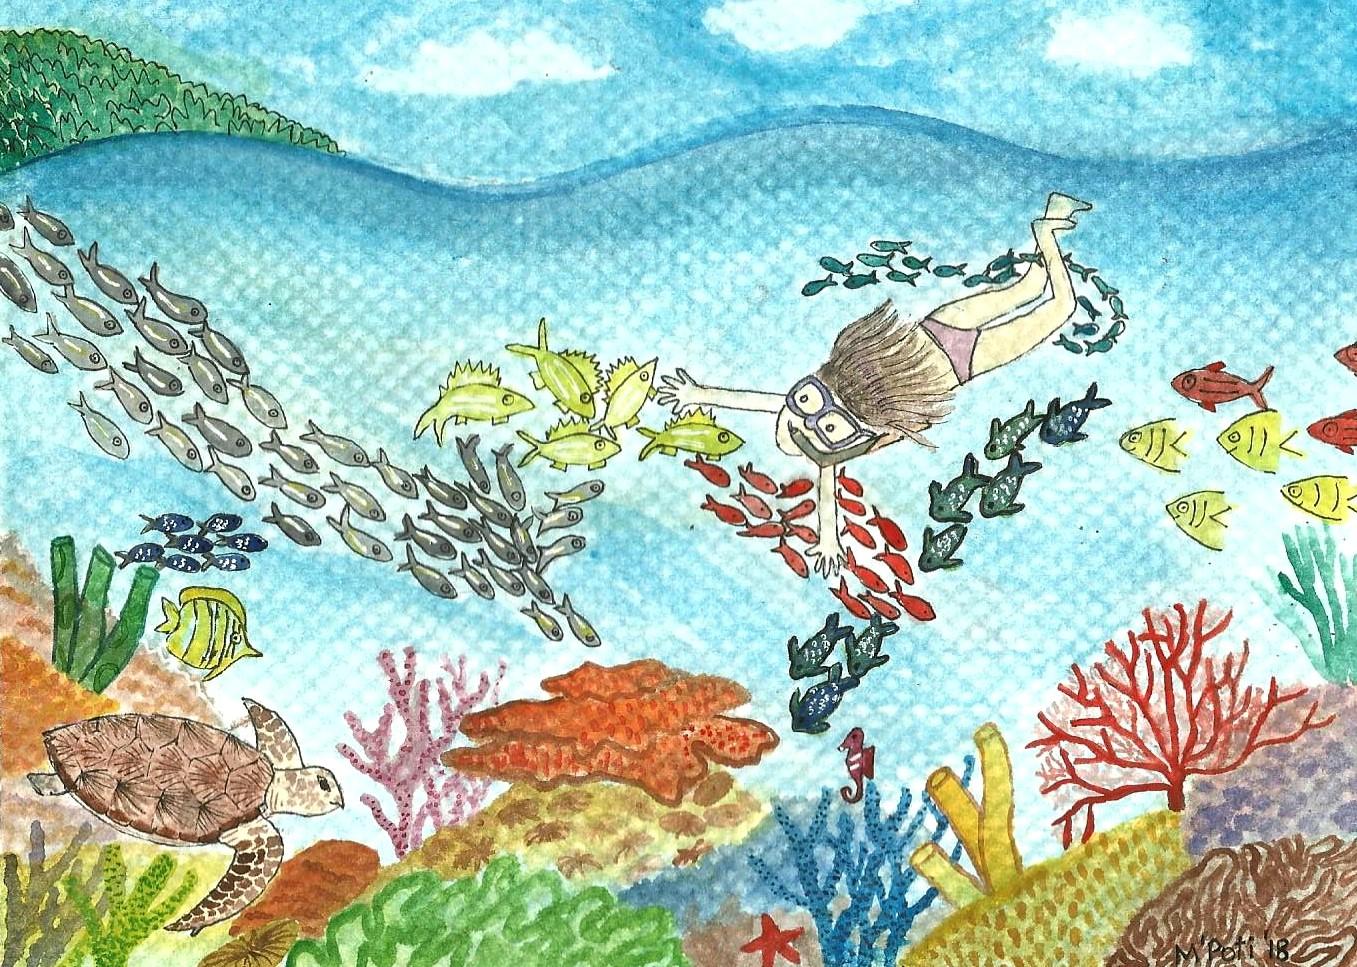 The innocence in the ocean